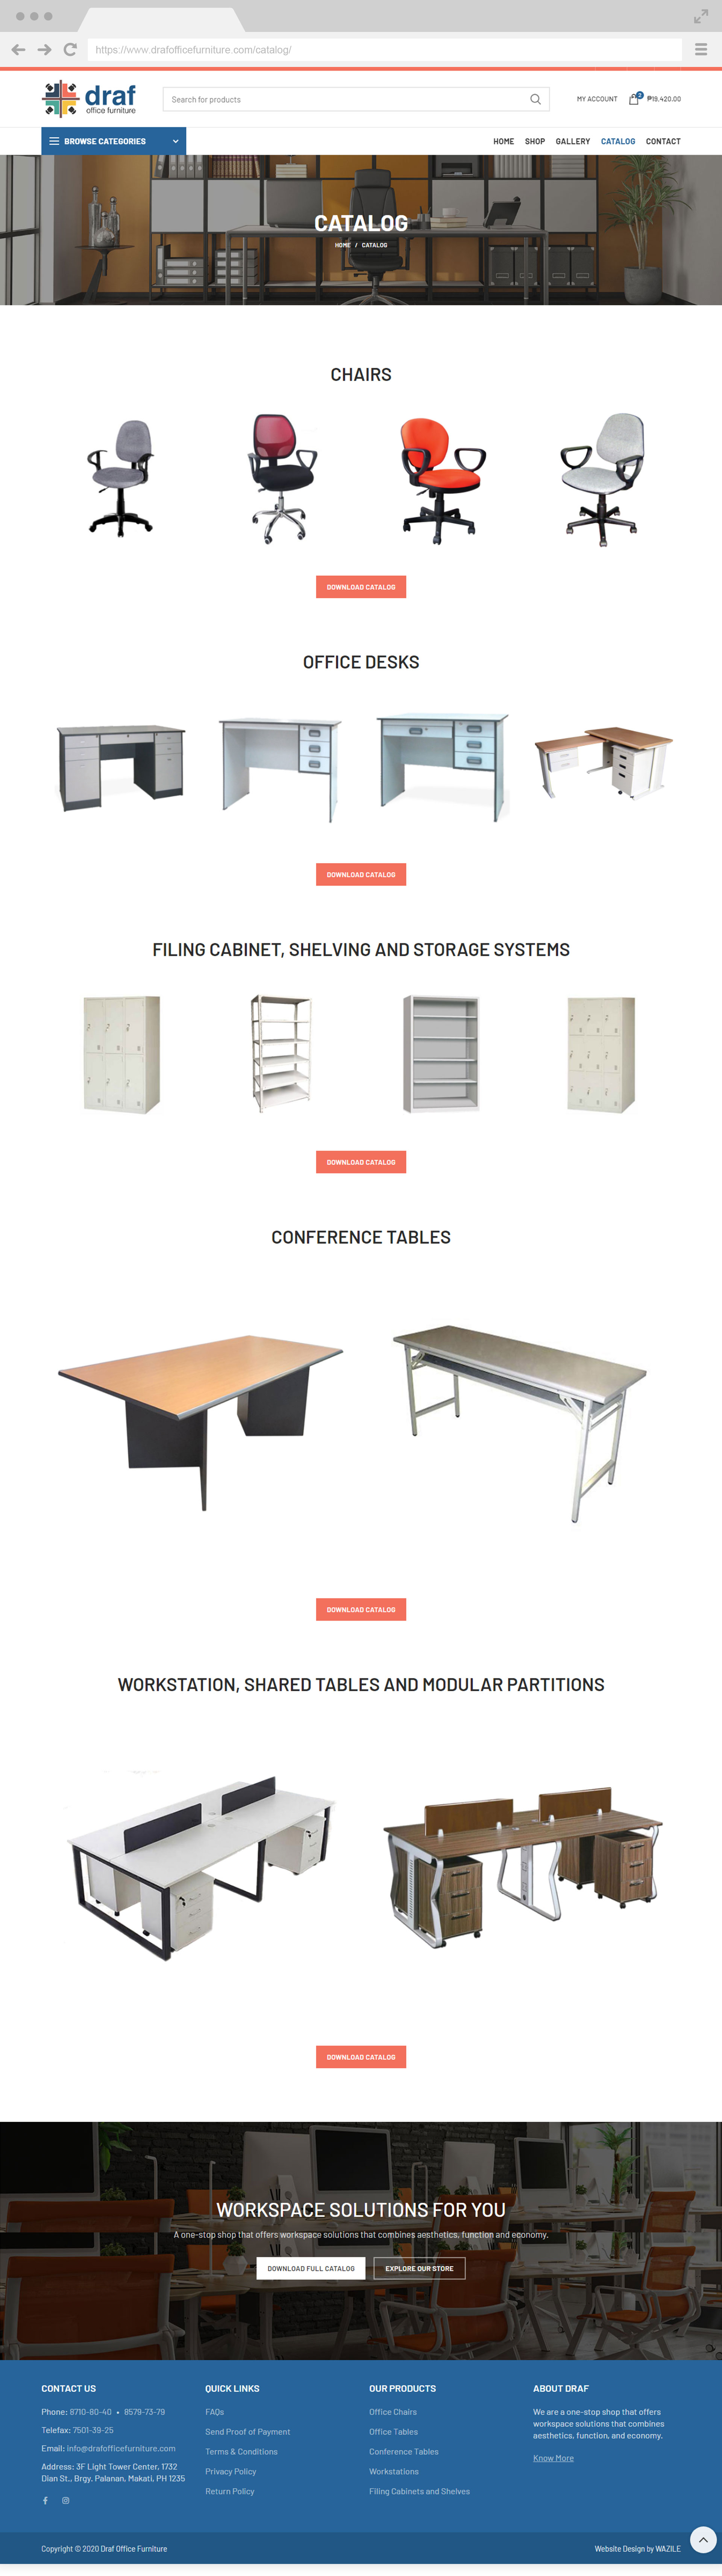 Draf Office Furniture Catalog